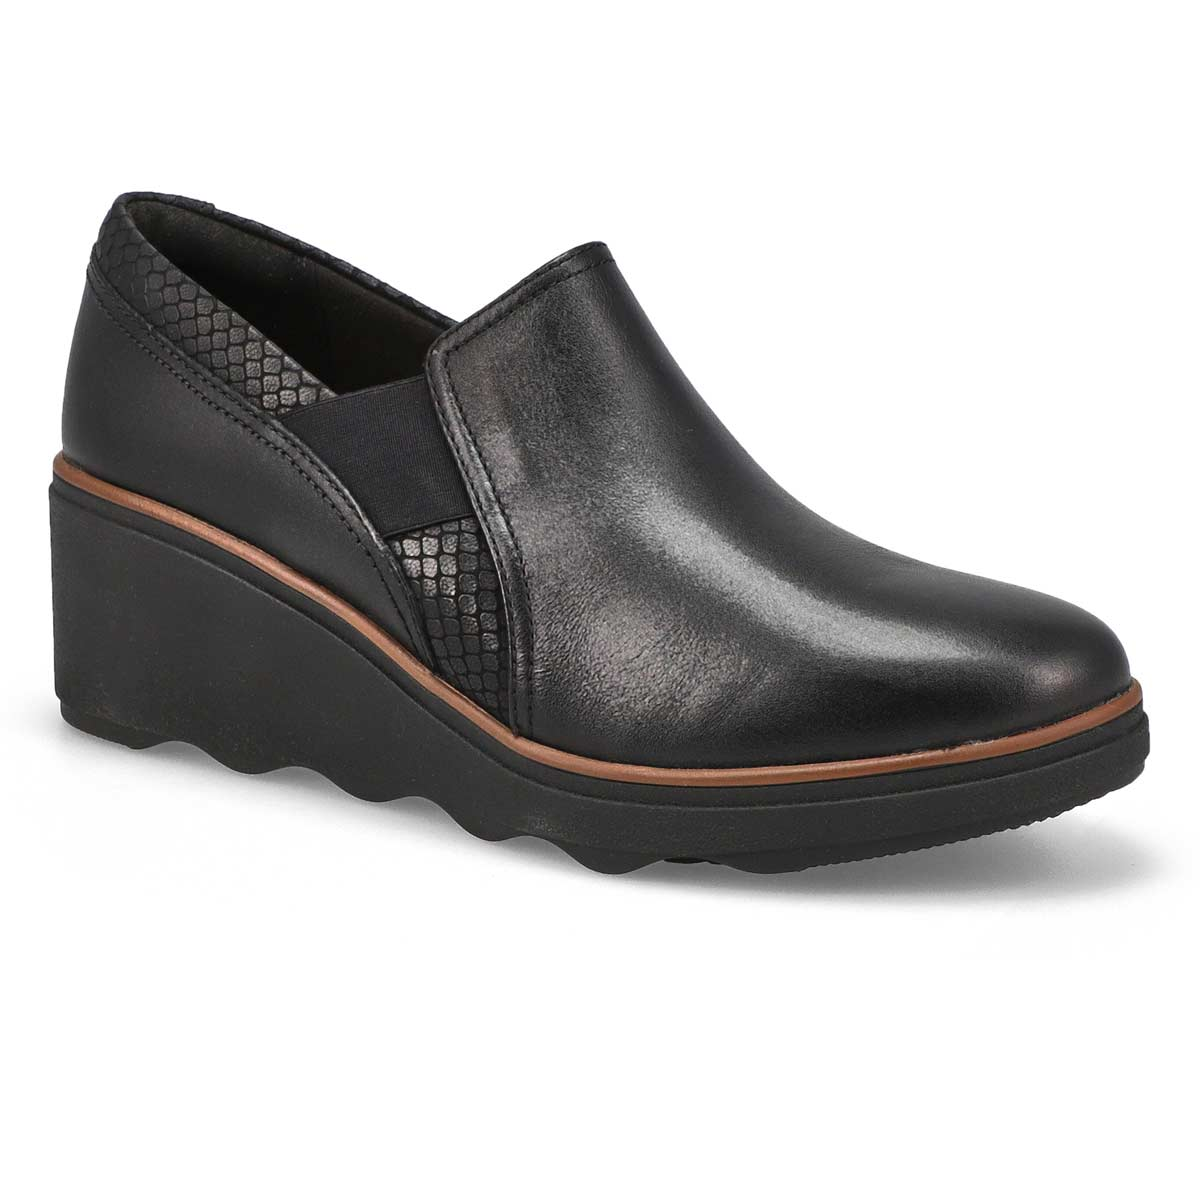 Women's Mazy Squam Dress Shoe - Black